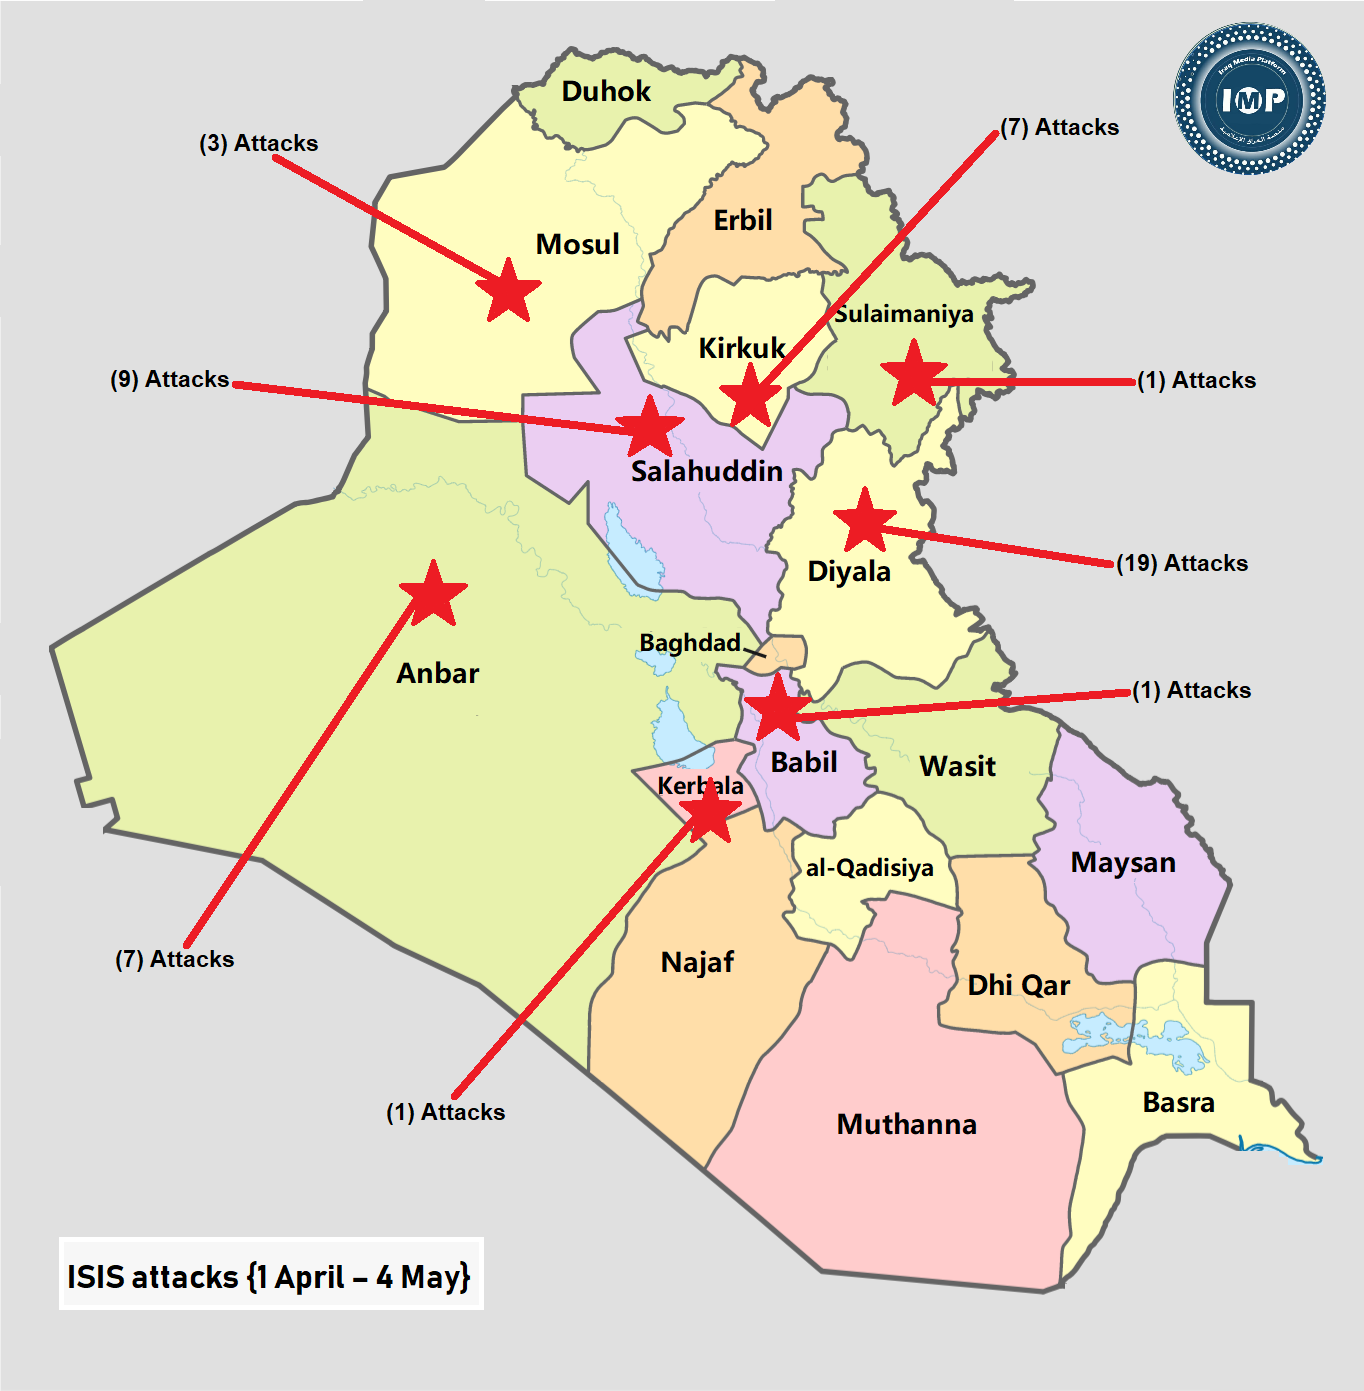 خارطة توضح مناطق تركز هجمات داعش